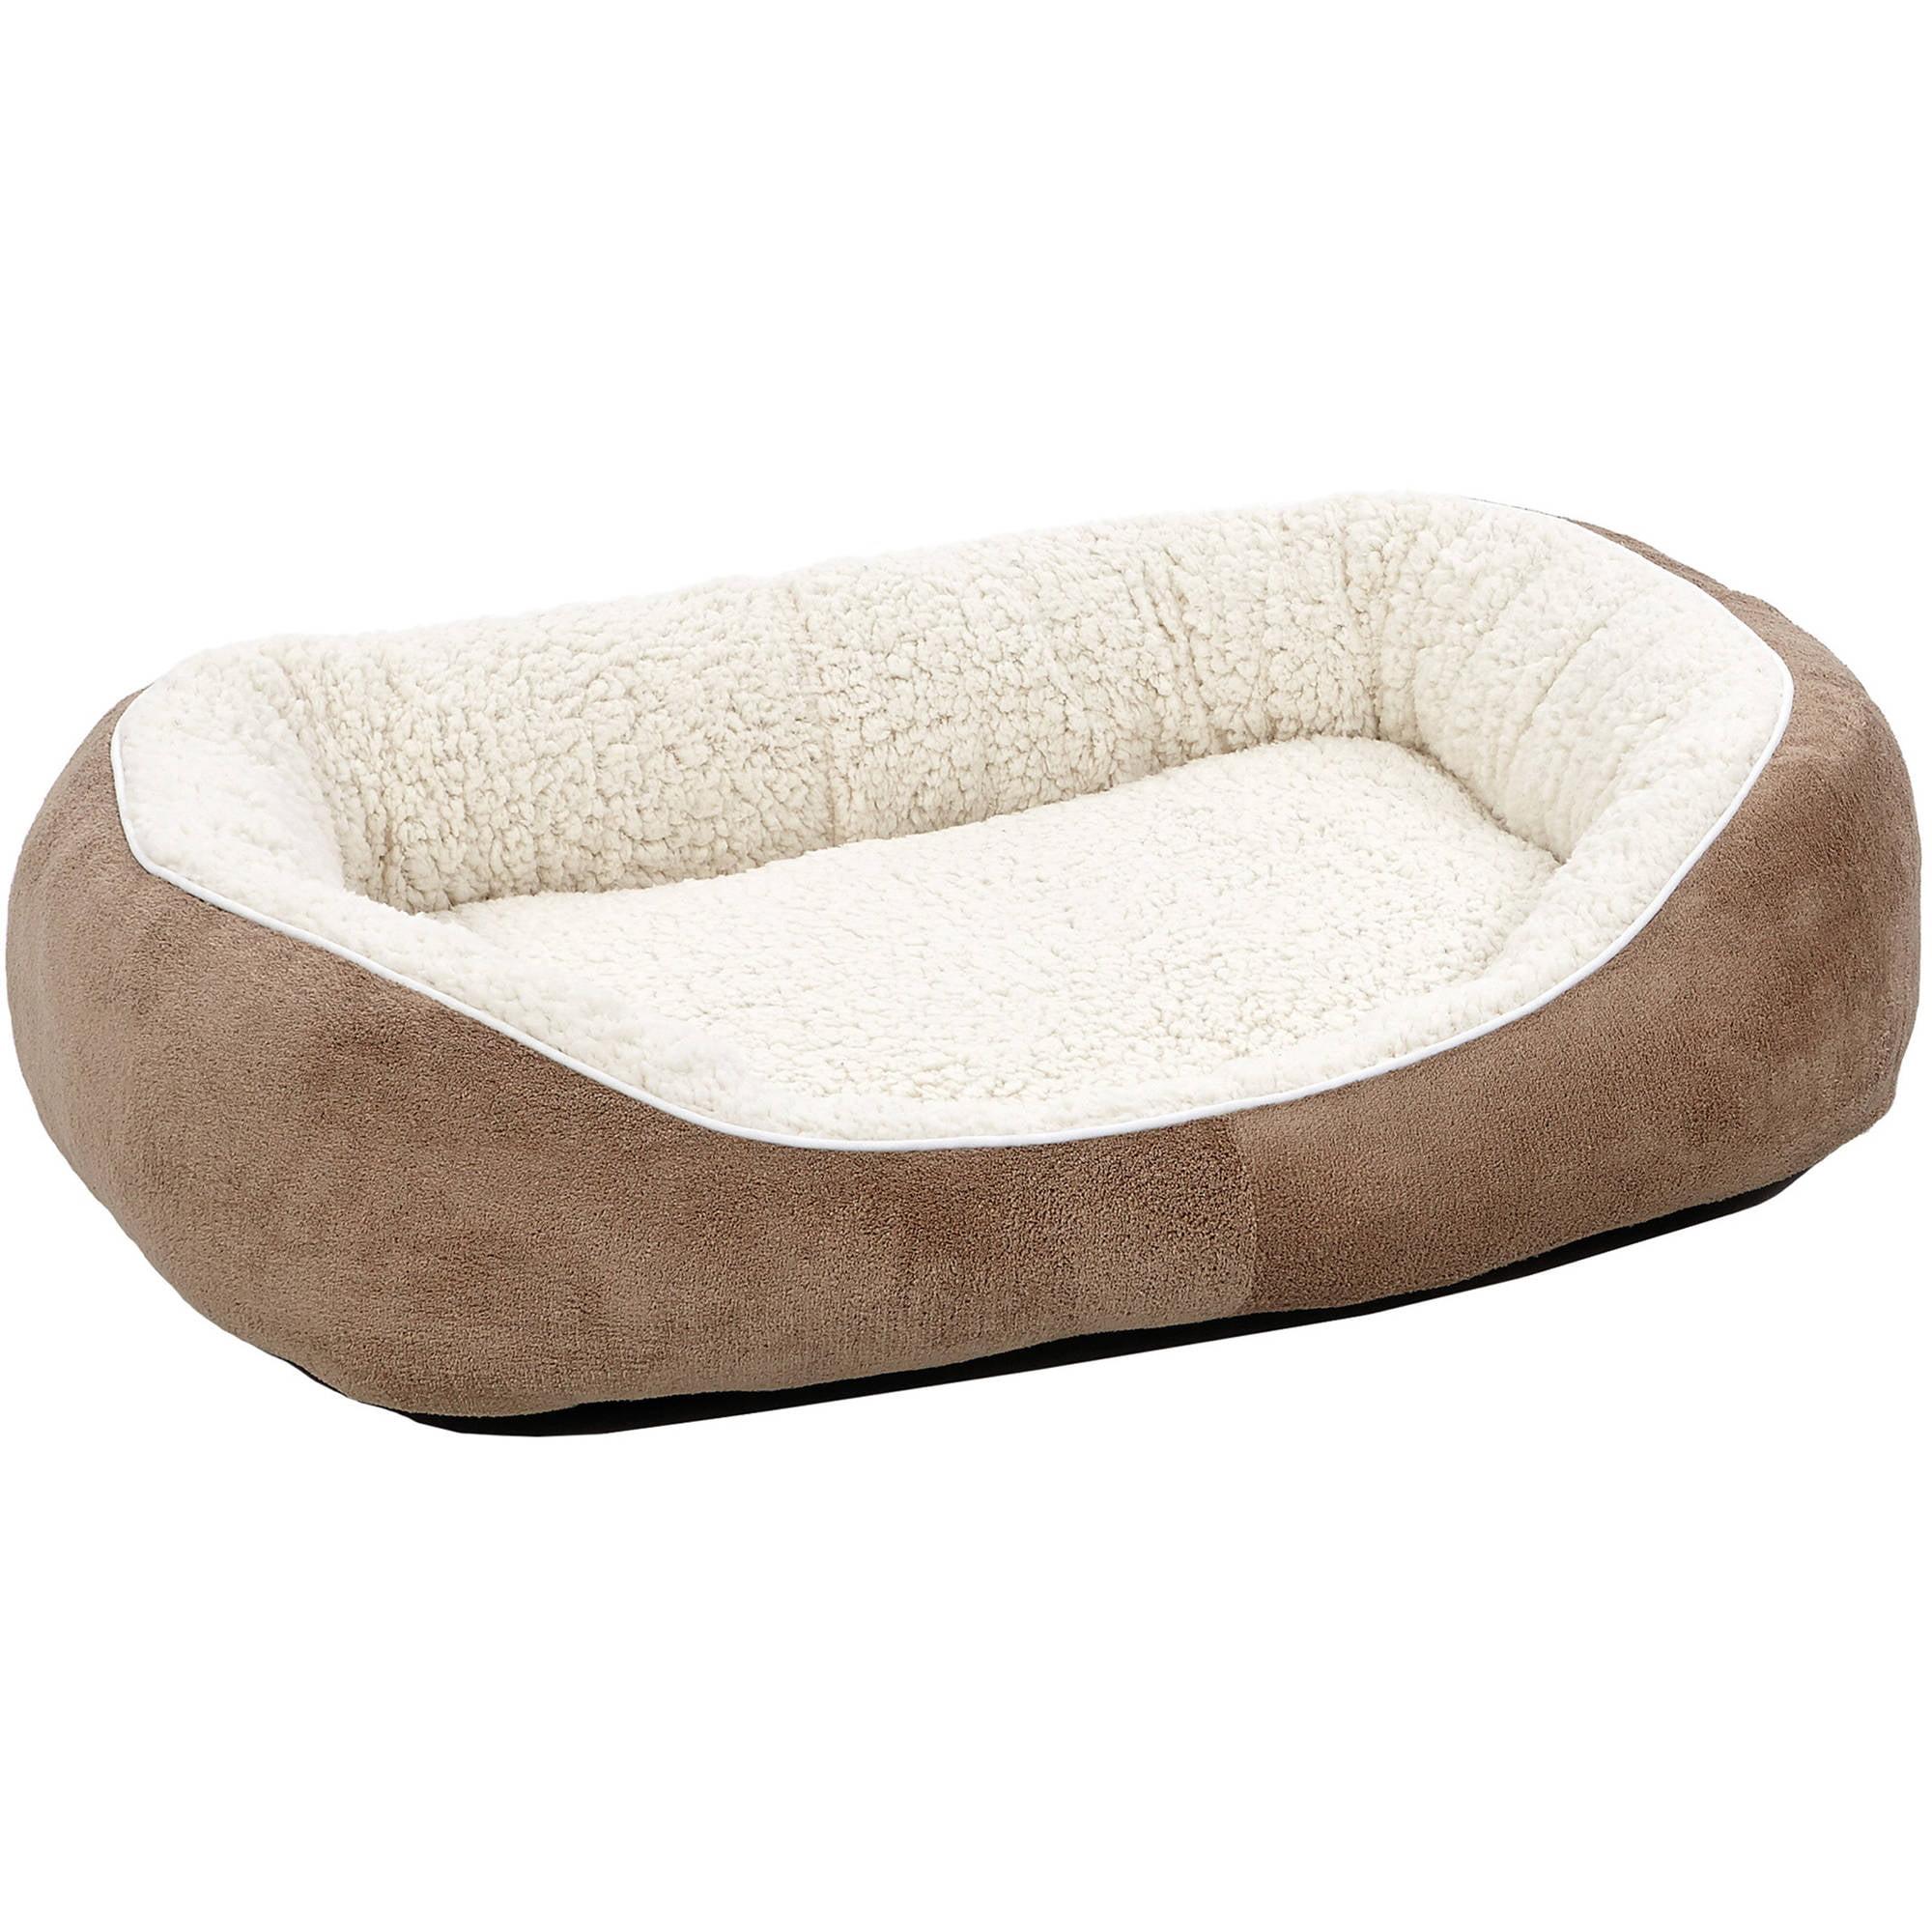 Midwest Medium Taupe Cuddle Bed